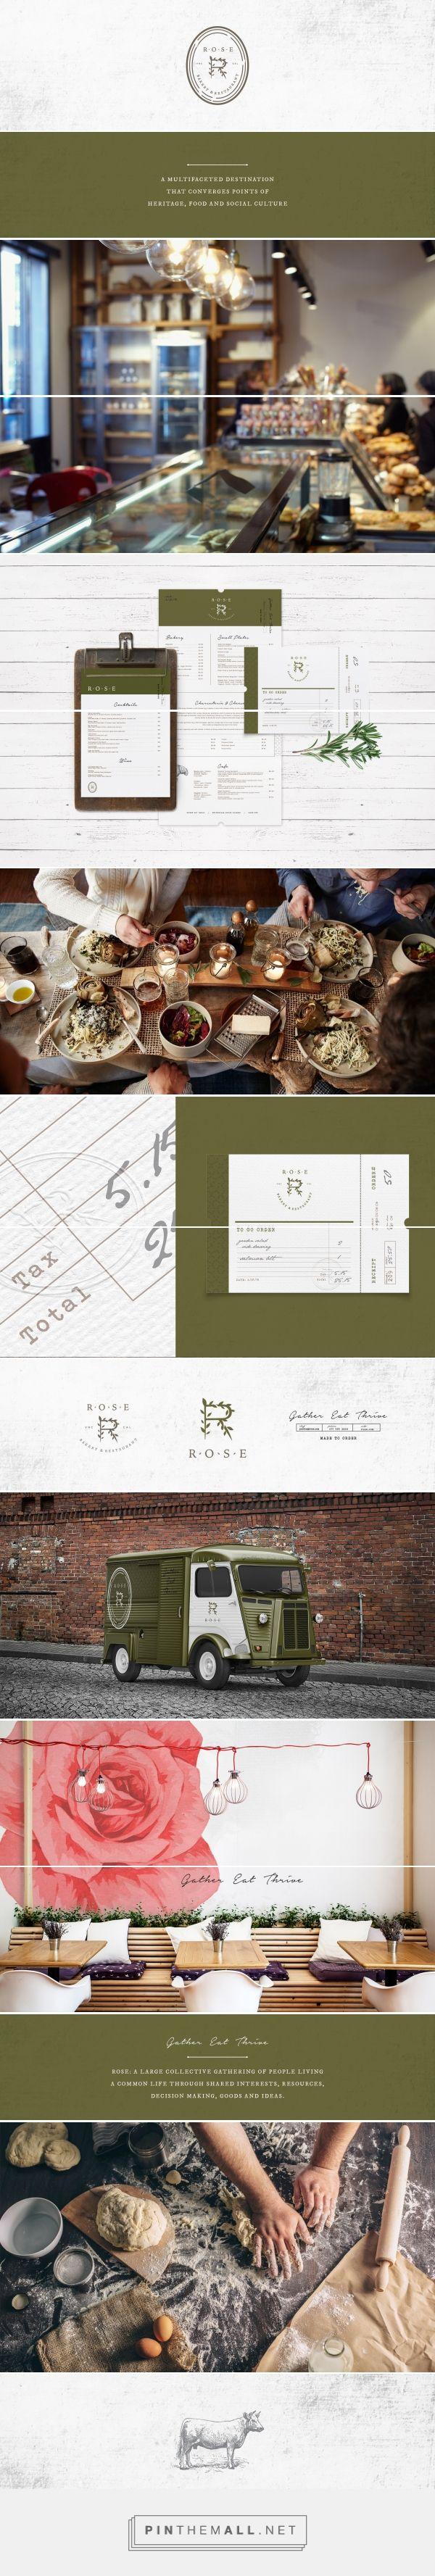 Restaurant designs restaurant logo creator restaurant logo maker - Rose Restaurant Branding And Menu Design By Farm Design